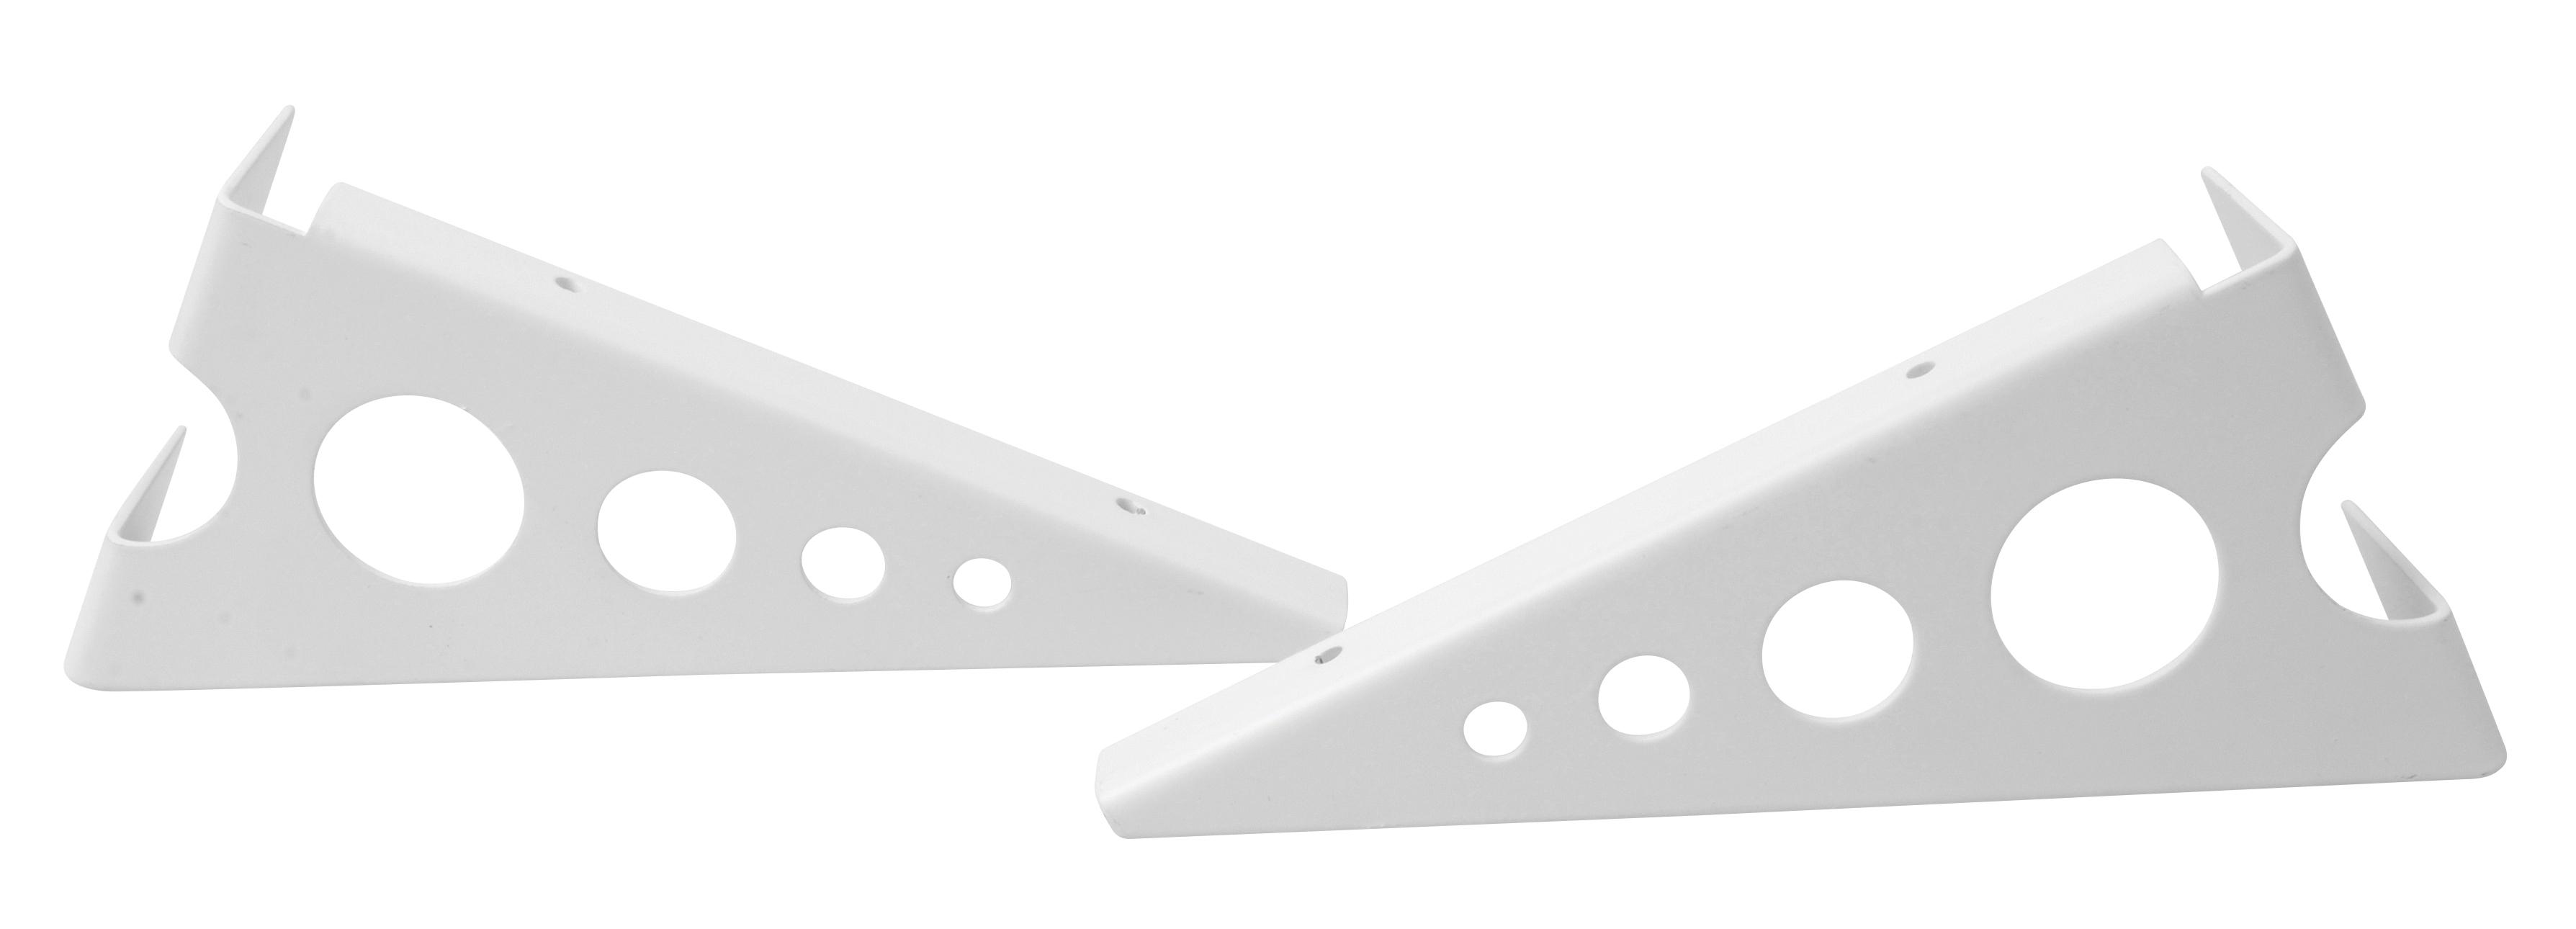 Hyldeknægt CPH 17 cm. 2 stk. - hvid